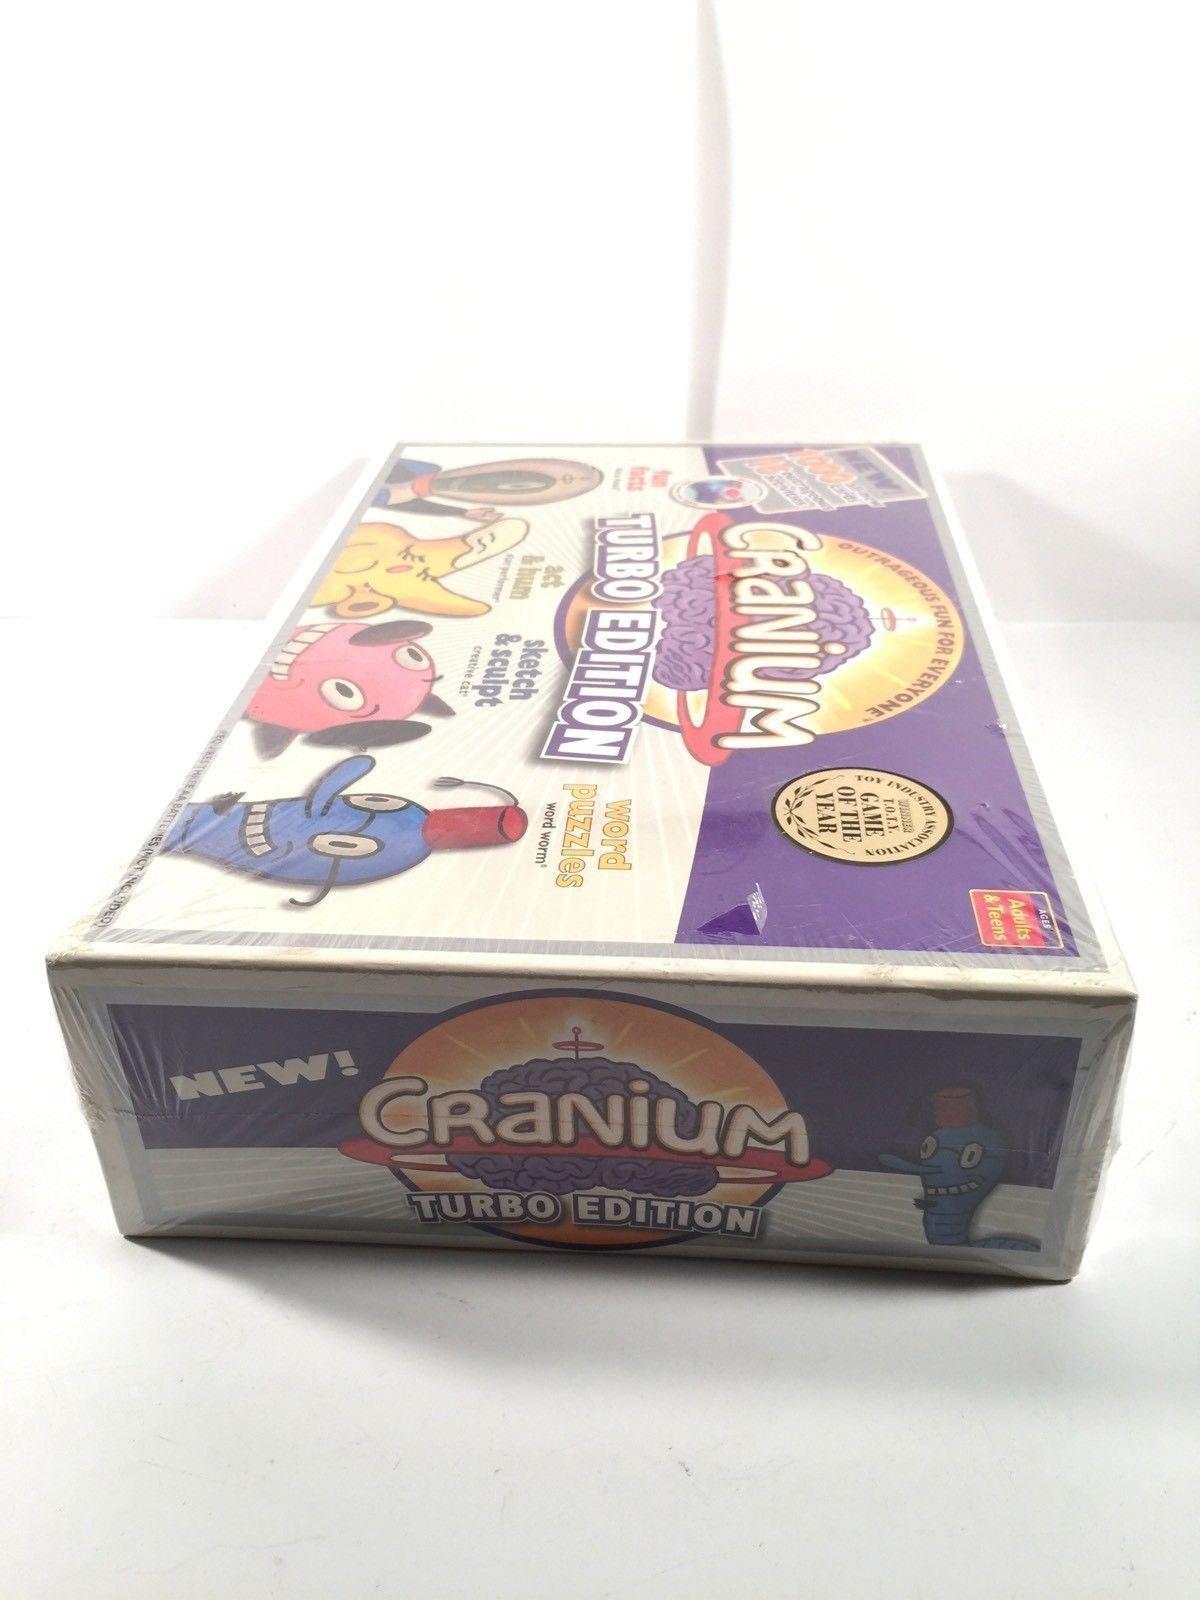 Baseman Cranium Turbo Edition 1000 NEW Cards 6 New Activities New In Box by Baseman (Image #5)